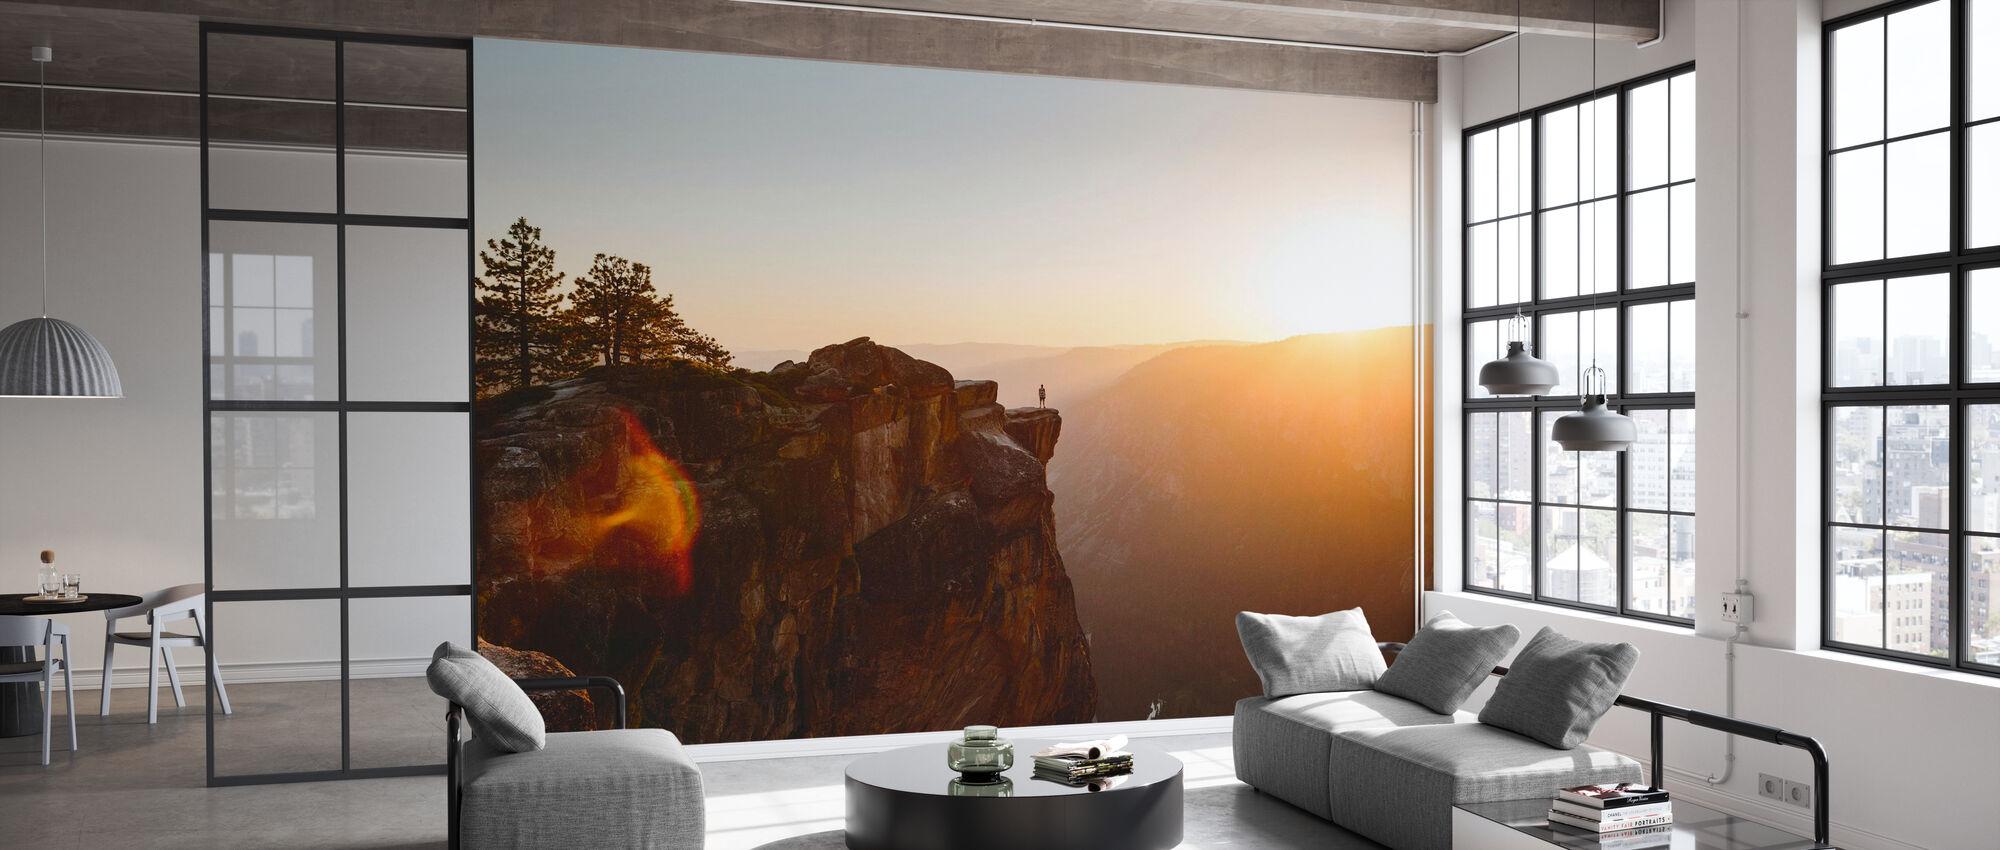 Taft Point, Yosemite National Park - Wallpaper - Office